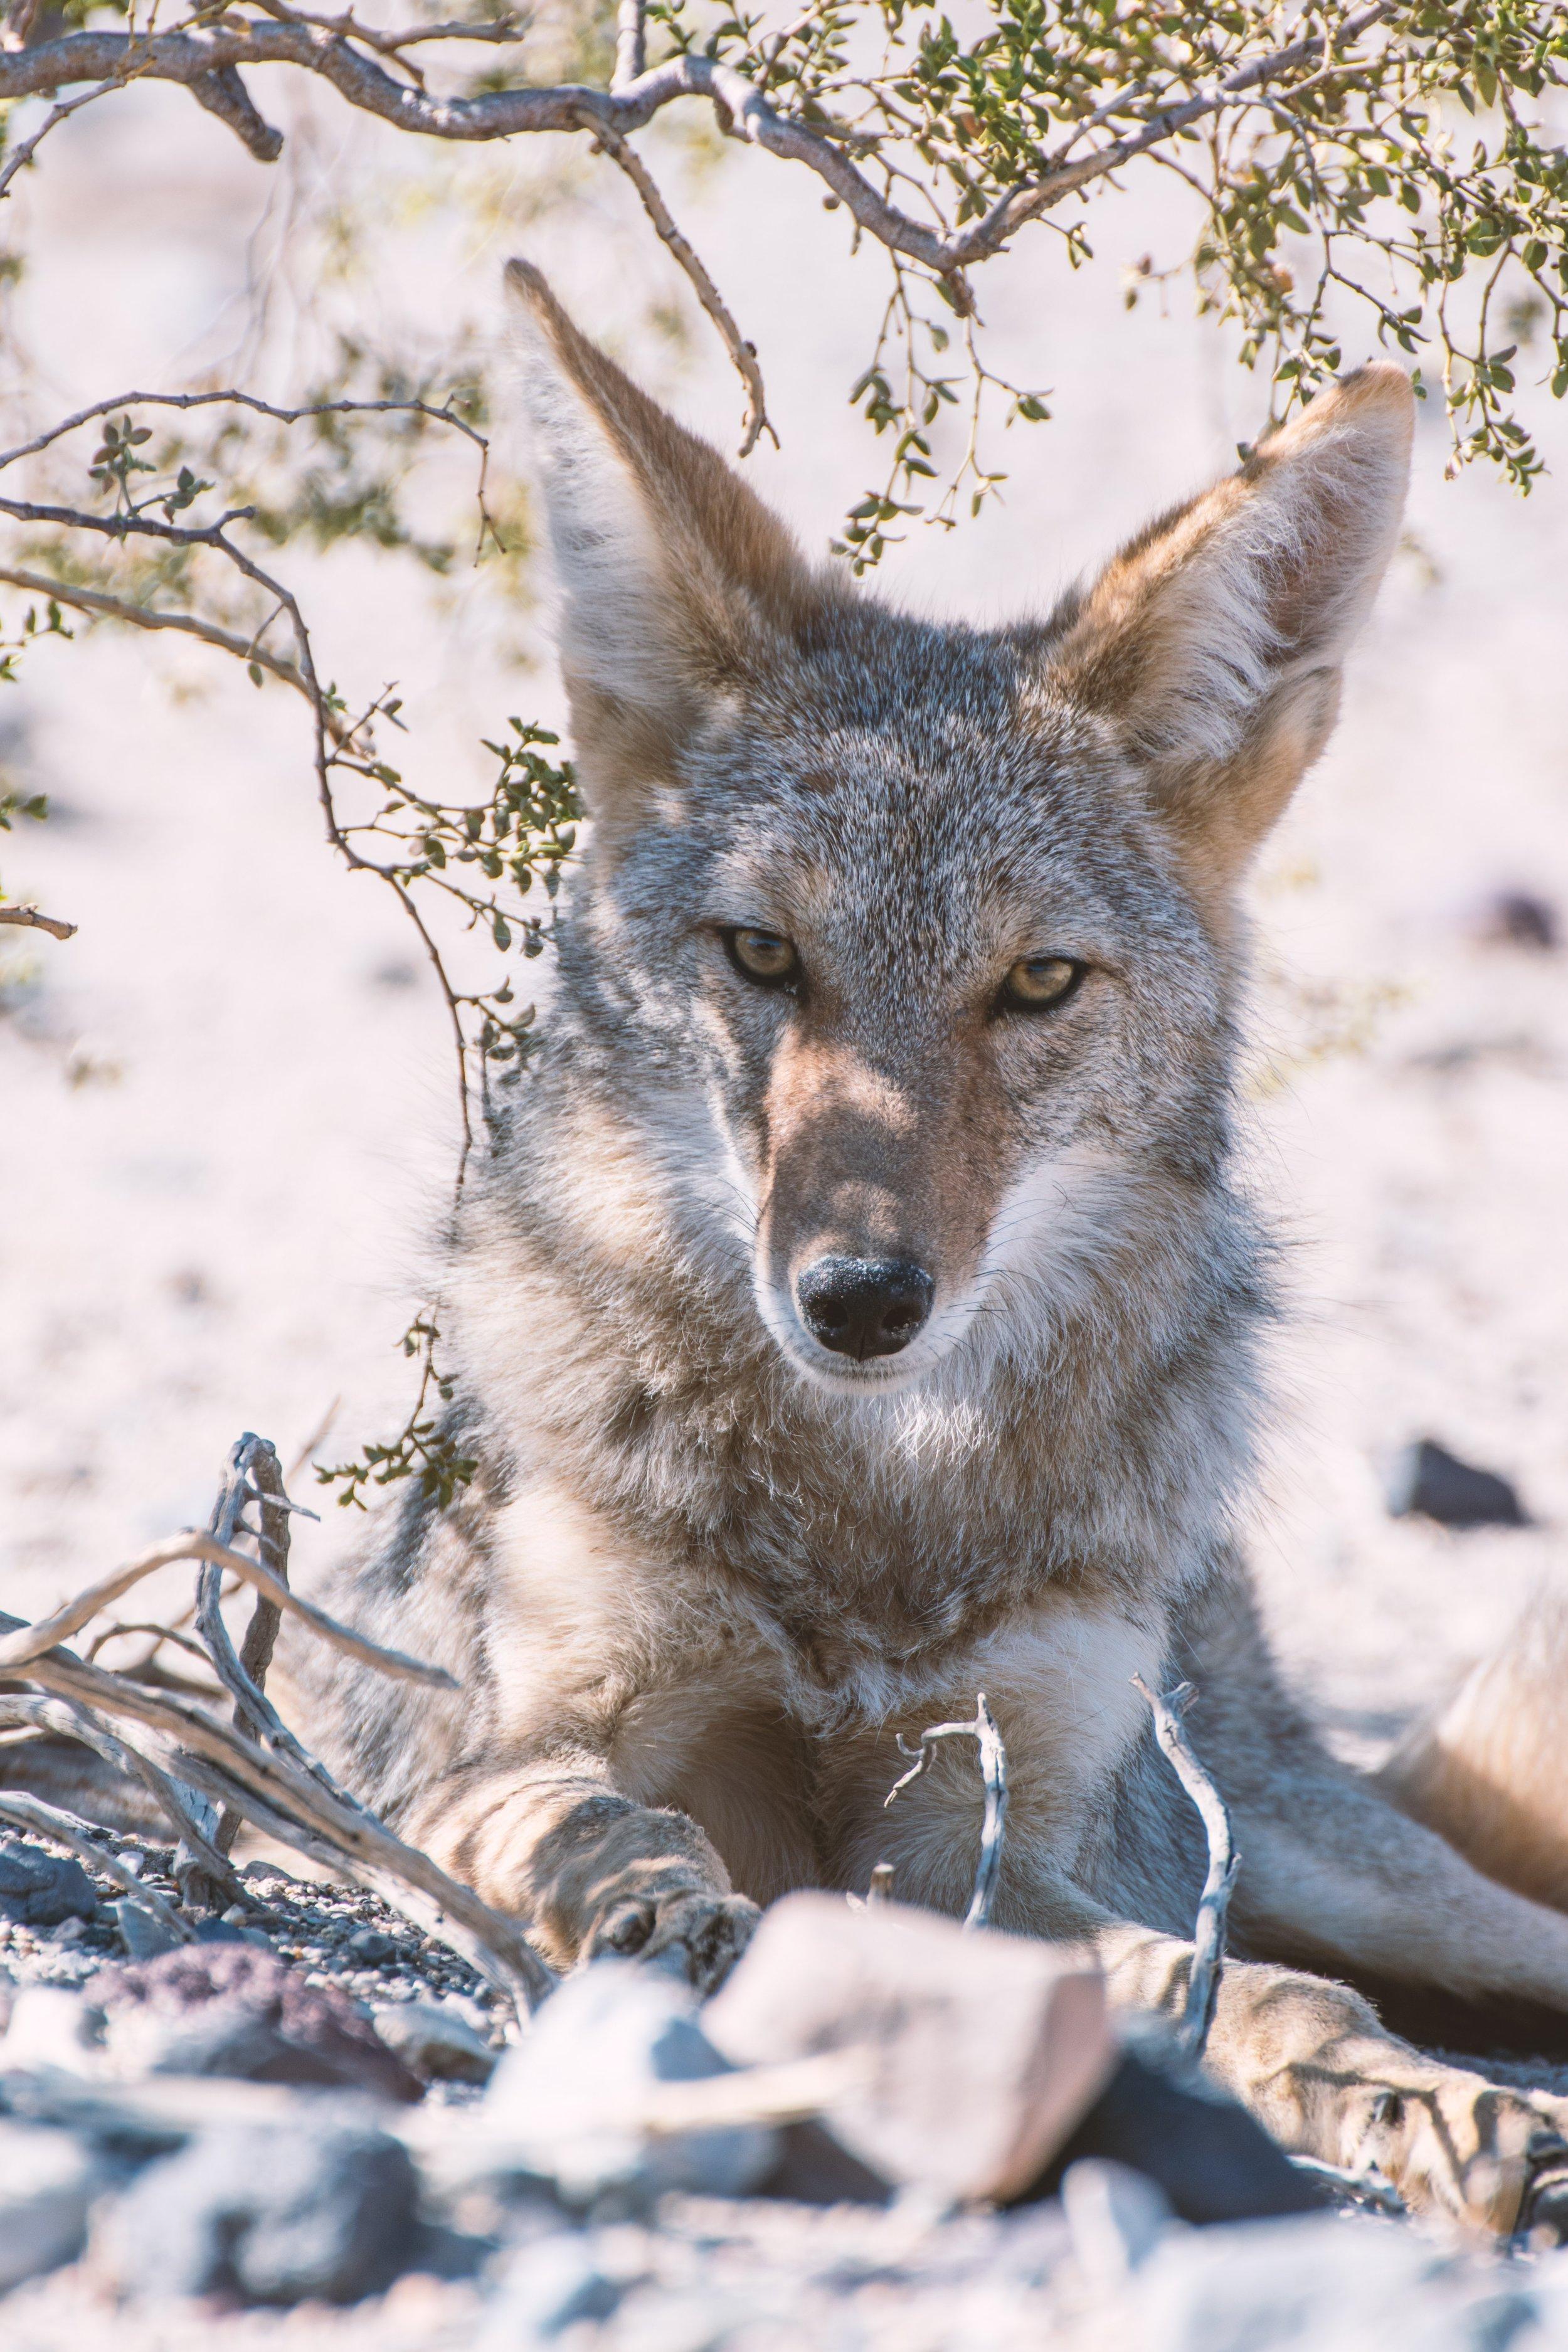 Coyote photo by Joshua Wilking via Unsplash